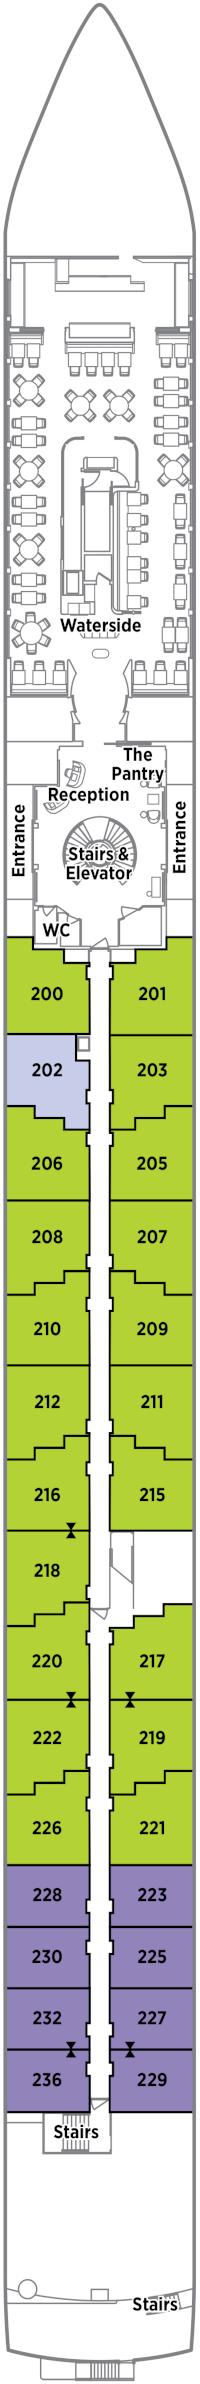 Crystal Bach Seahorse Deck Deck Plan